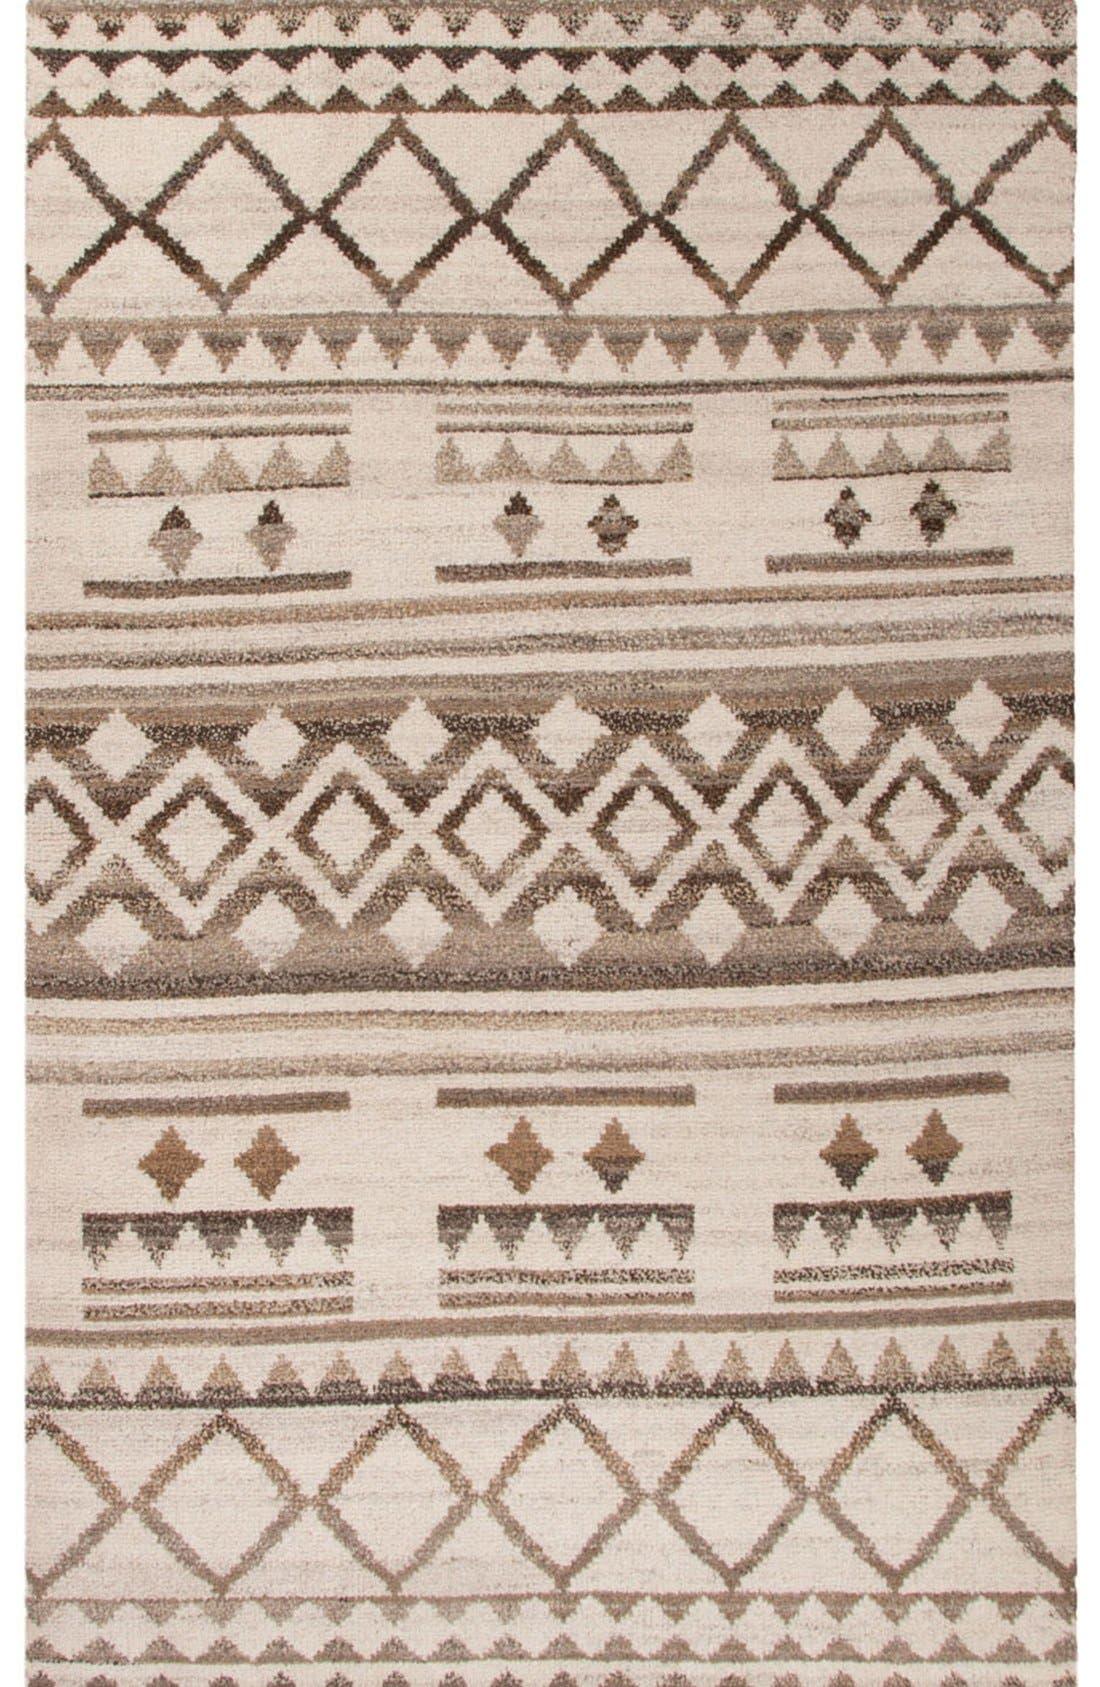 'Vanden Bohemian' Wool Rug,                             Main thumbnail 1, color,                             210